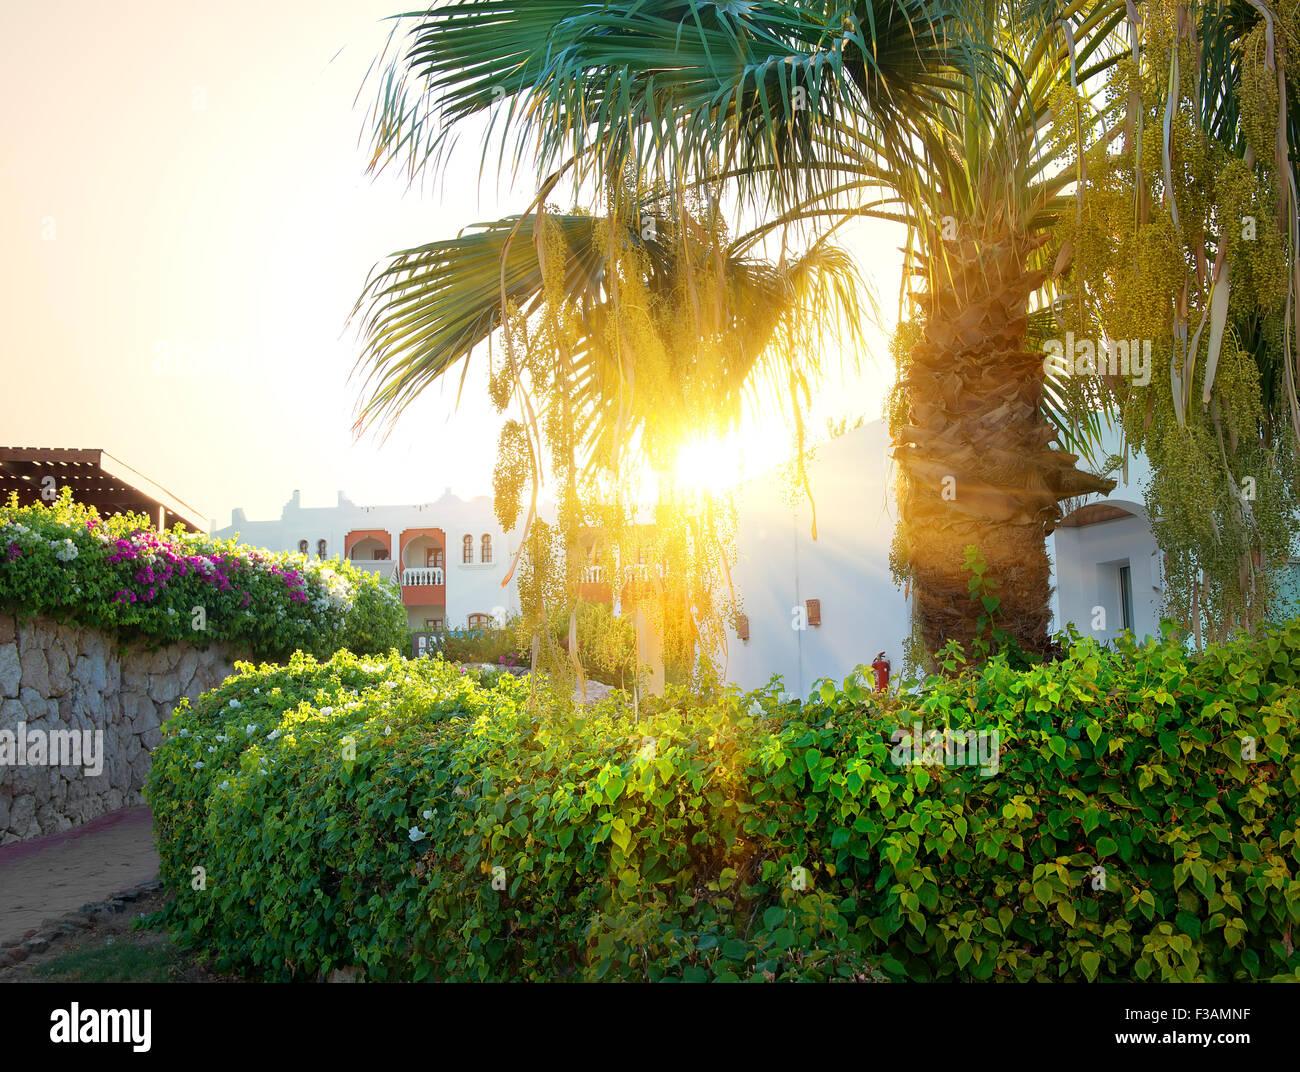 Hellen Sonnenaufgang über Resorthotel in Ägypten Stockbild